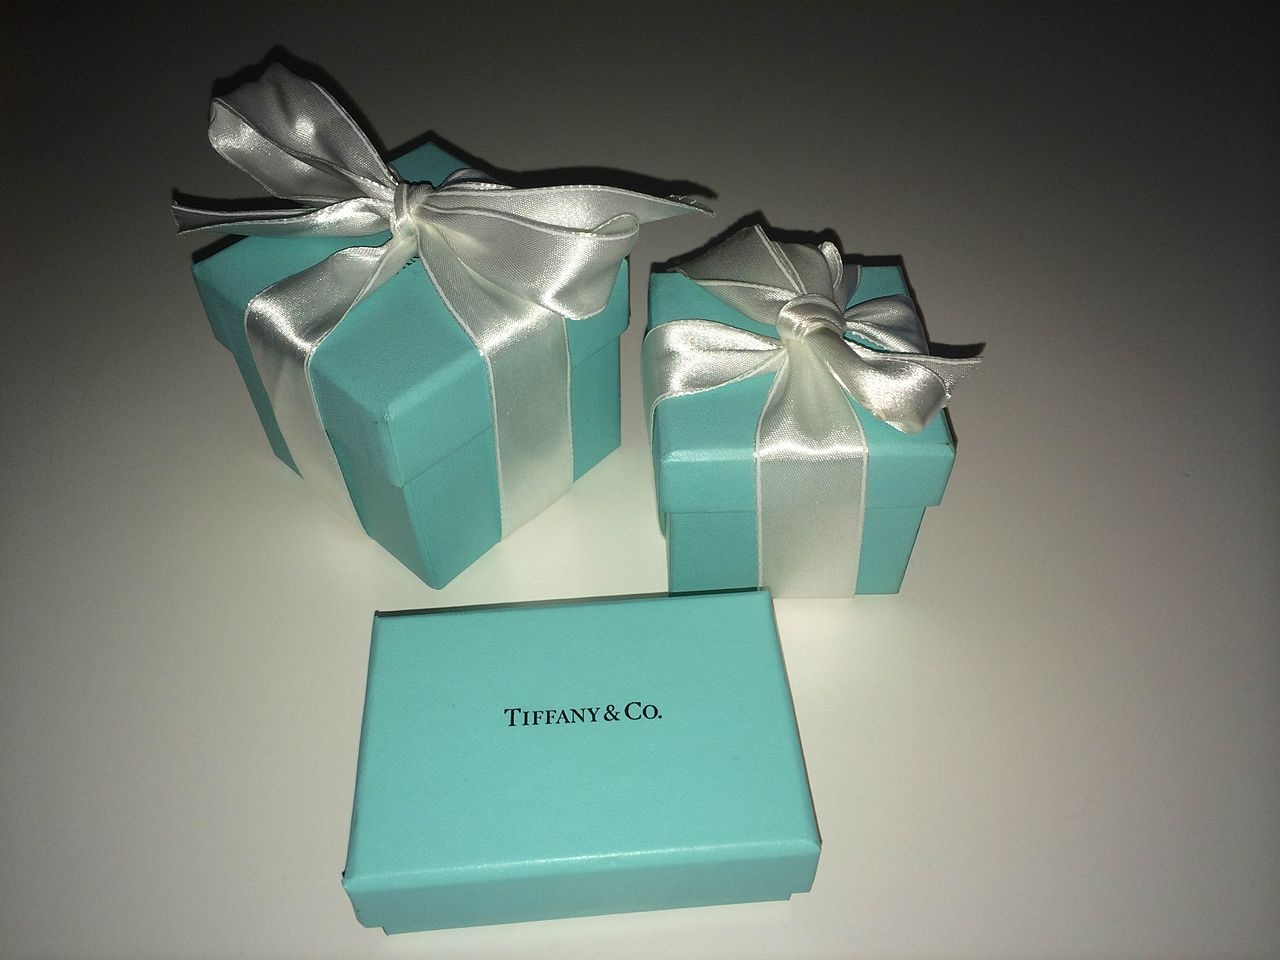 File:Tiffany blue box 1.jpg - Wikimedia Commons